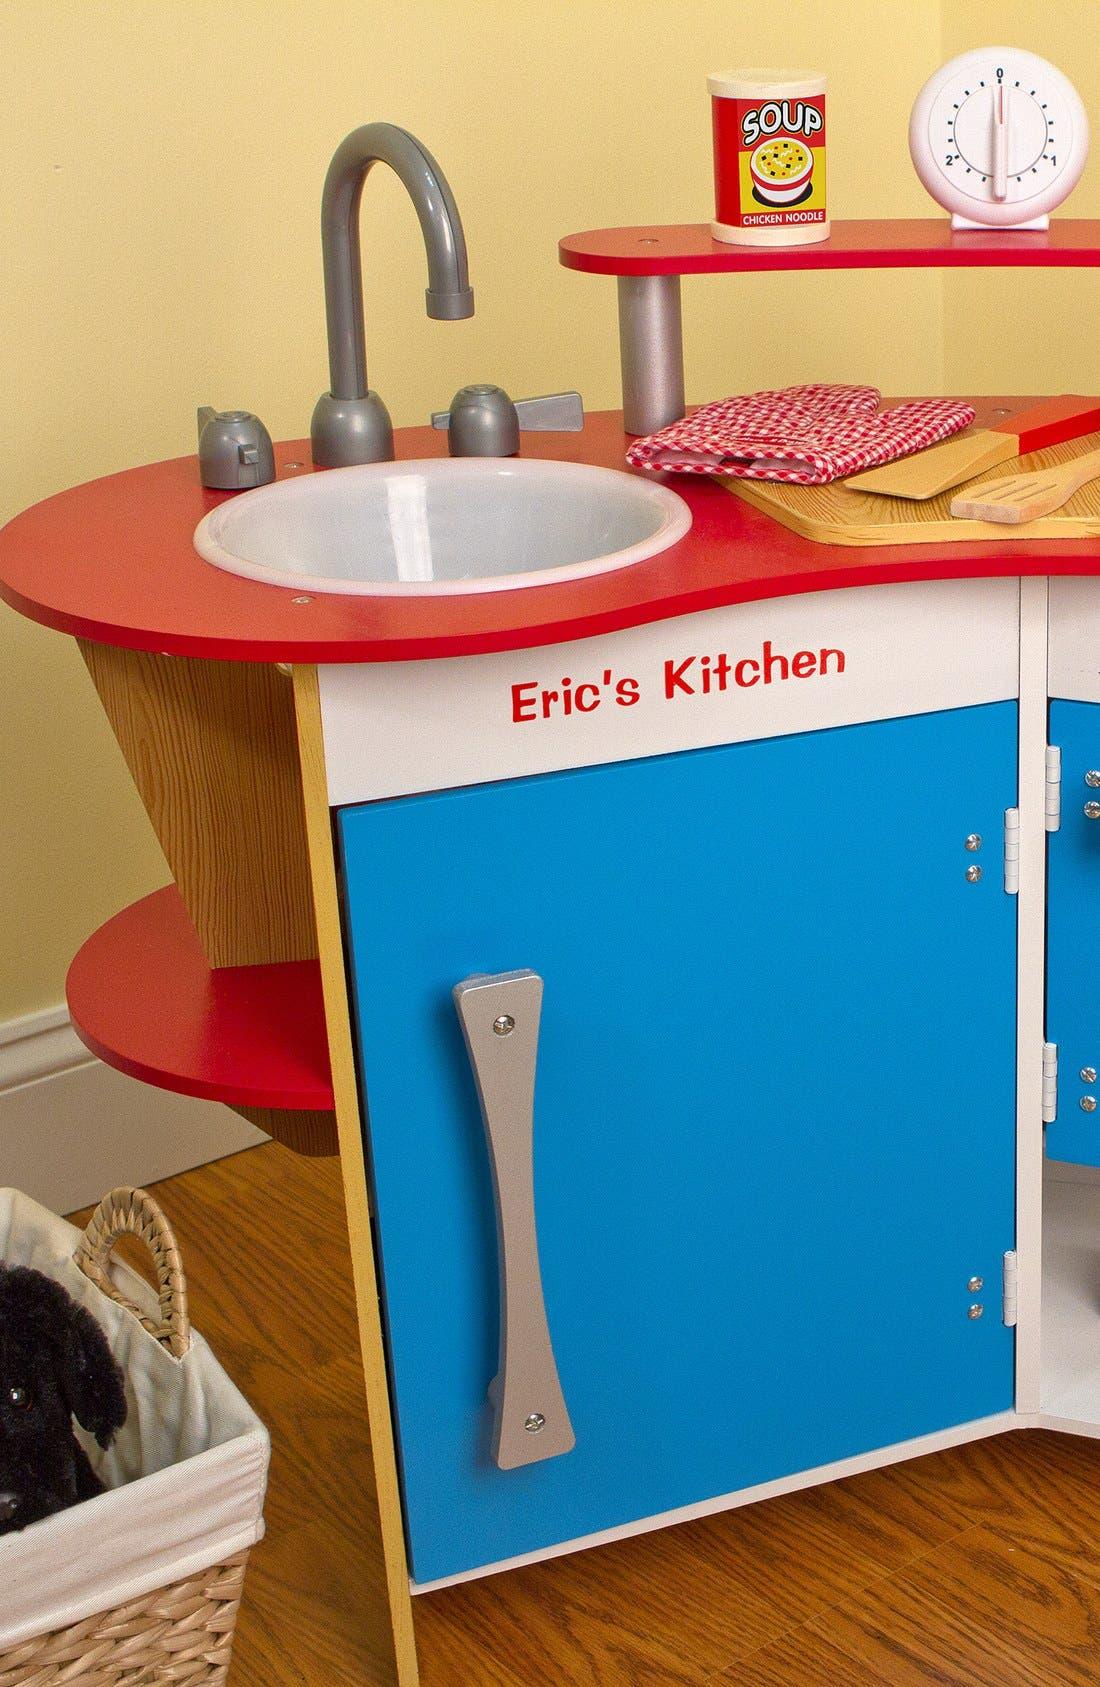 Melissa & Doug 'Cook's Corner' Personalized Kitchen